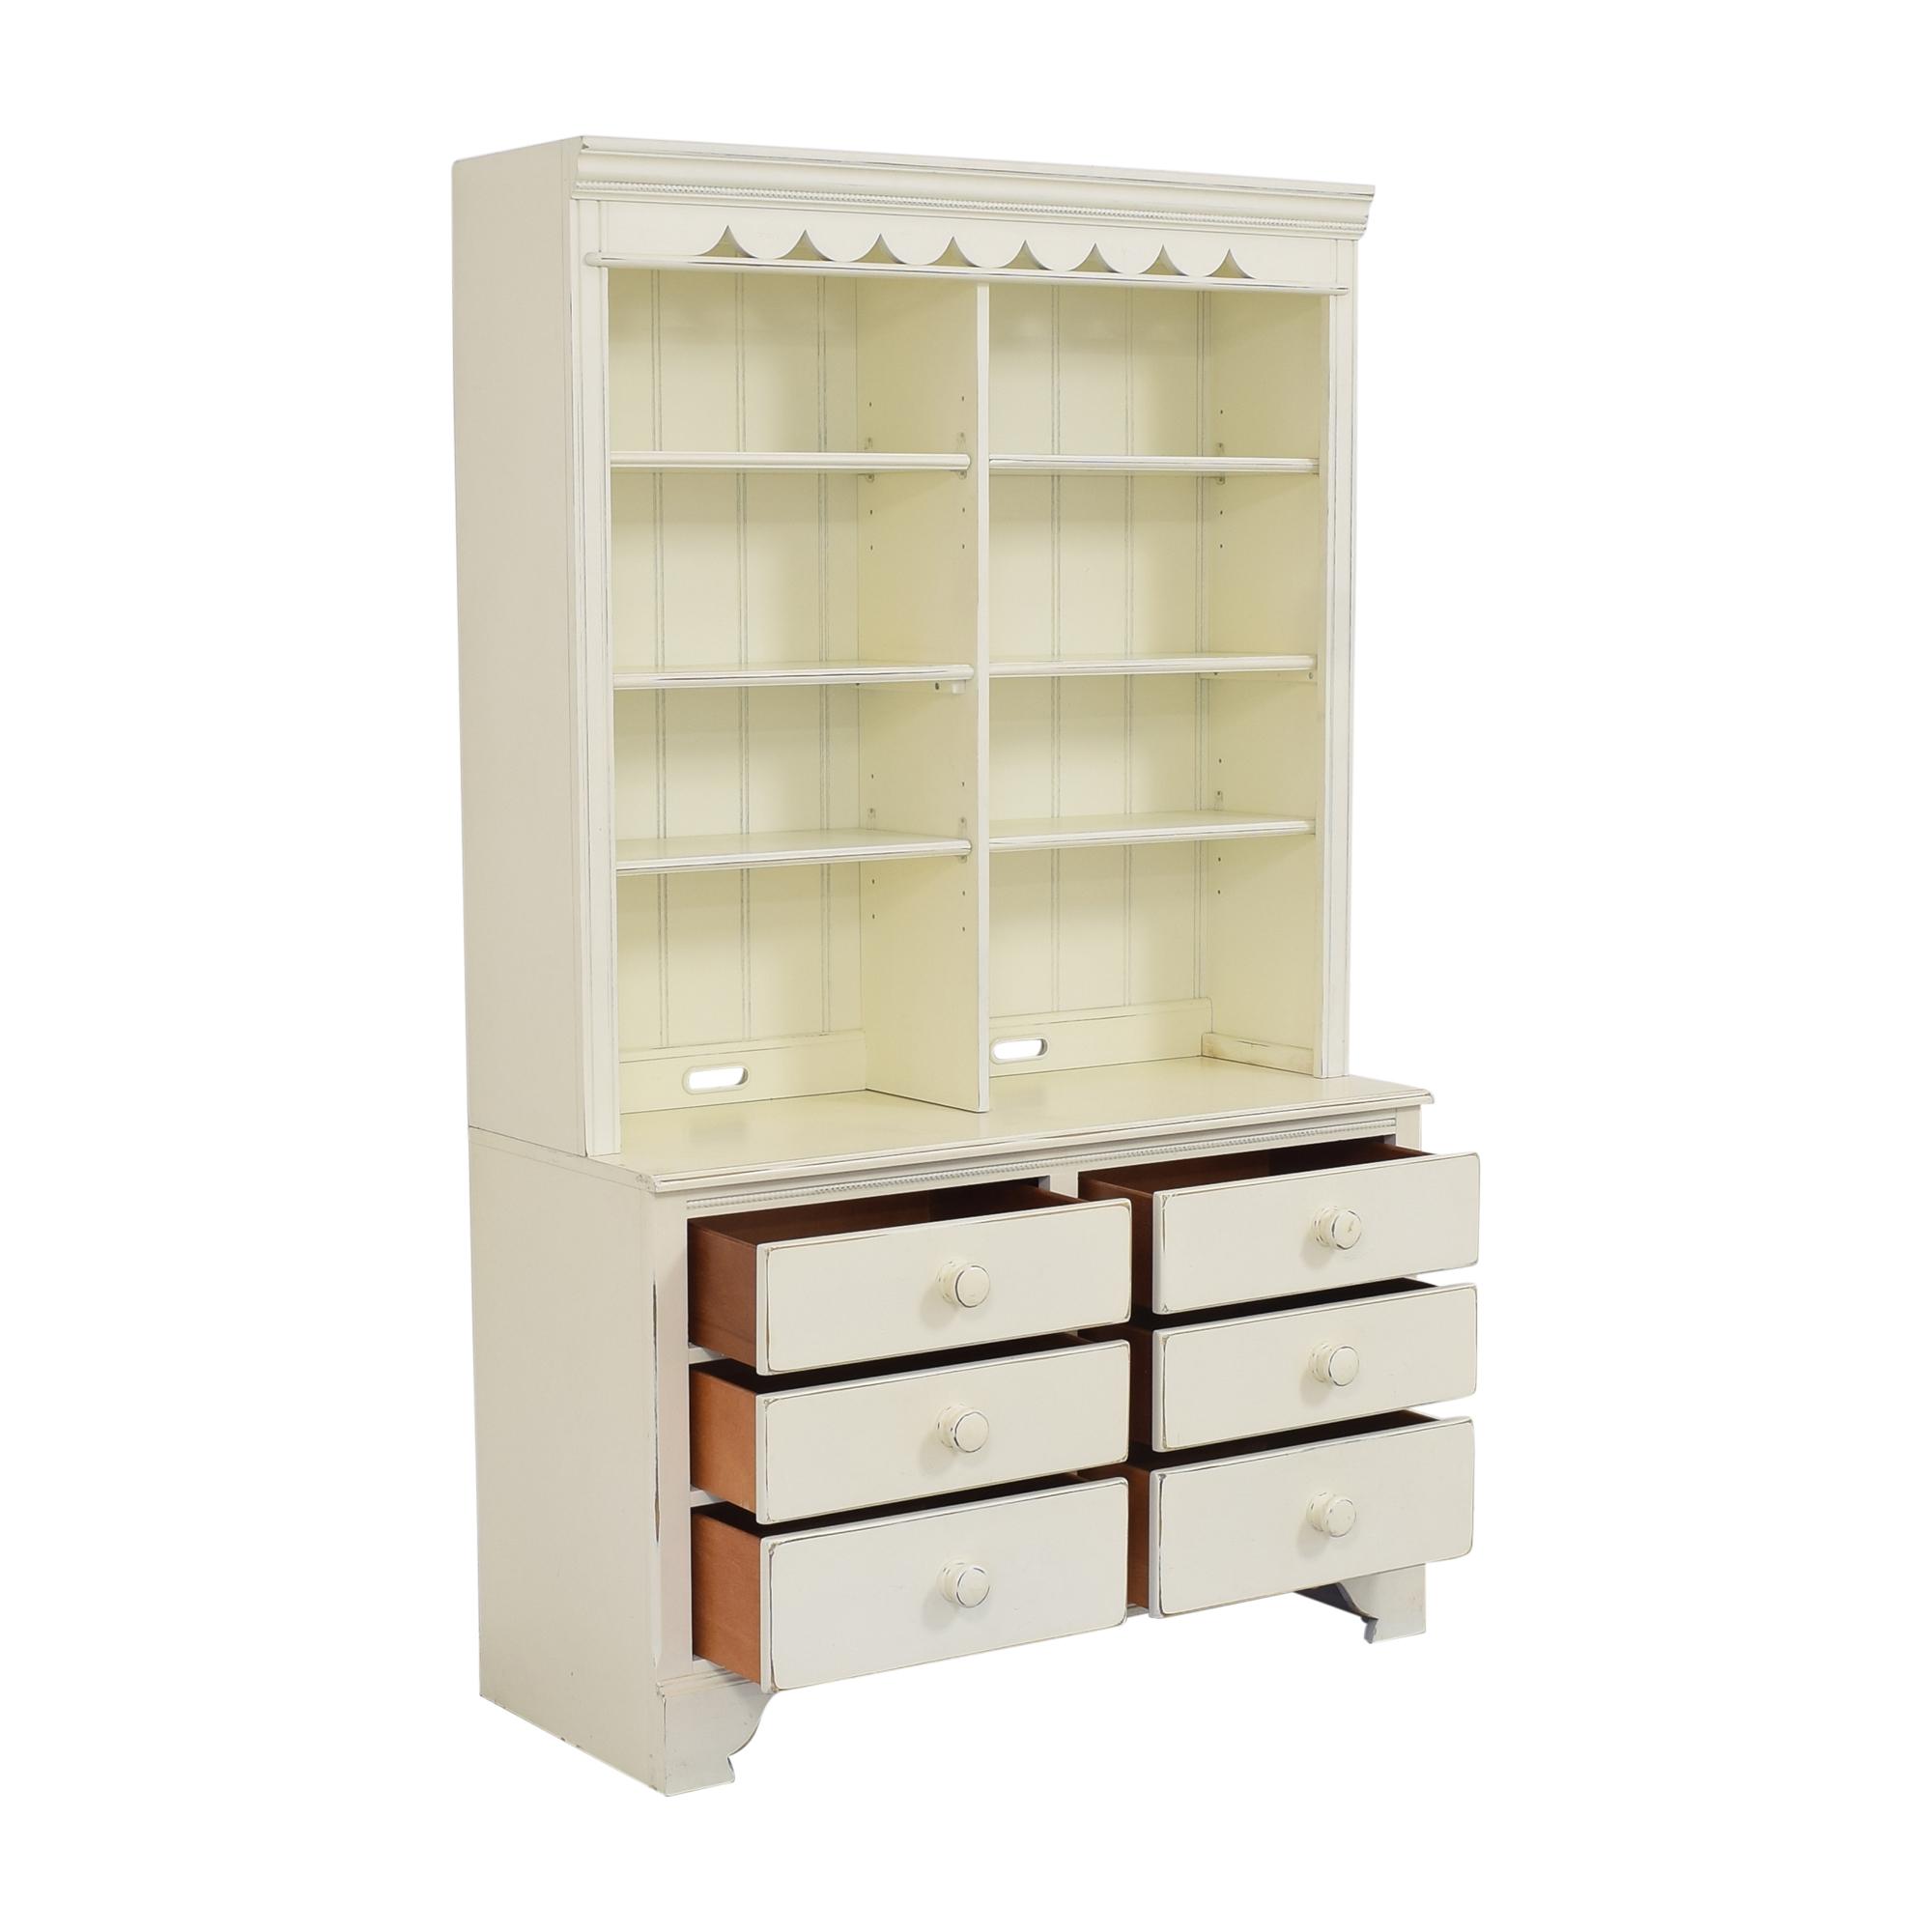 Lexington Furniture Betsy Cameron for Lexington Dresser with Hutch pa